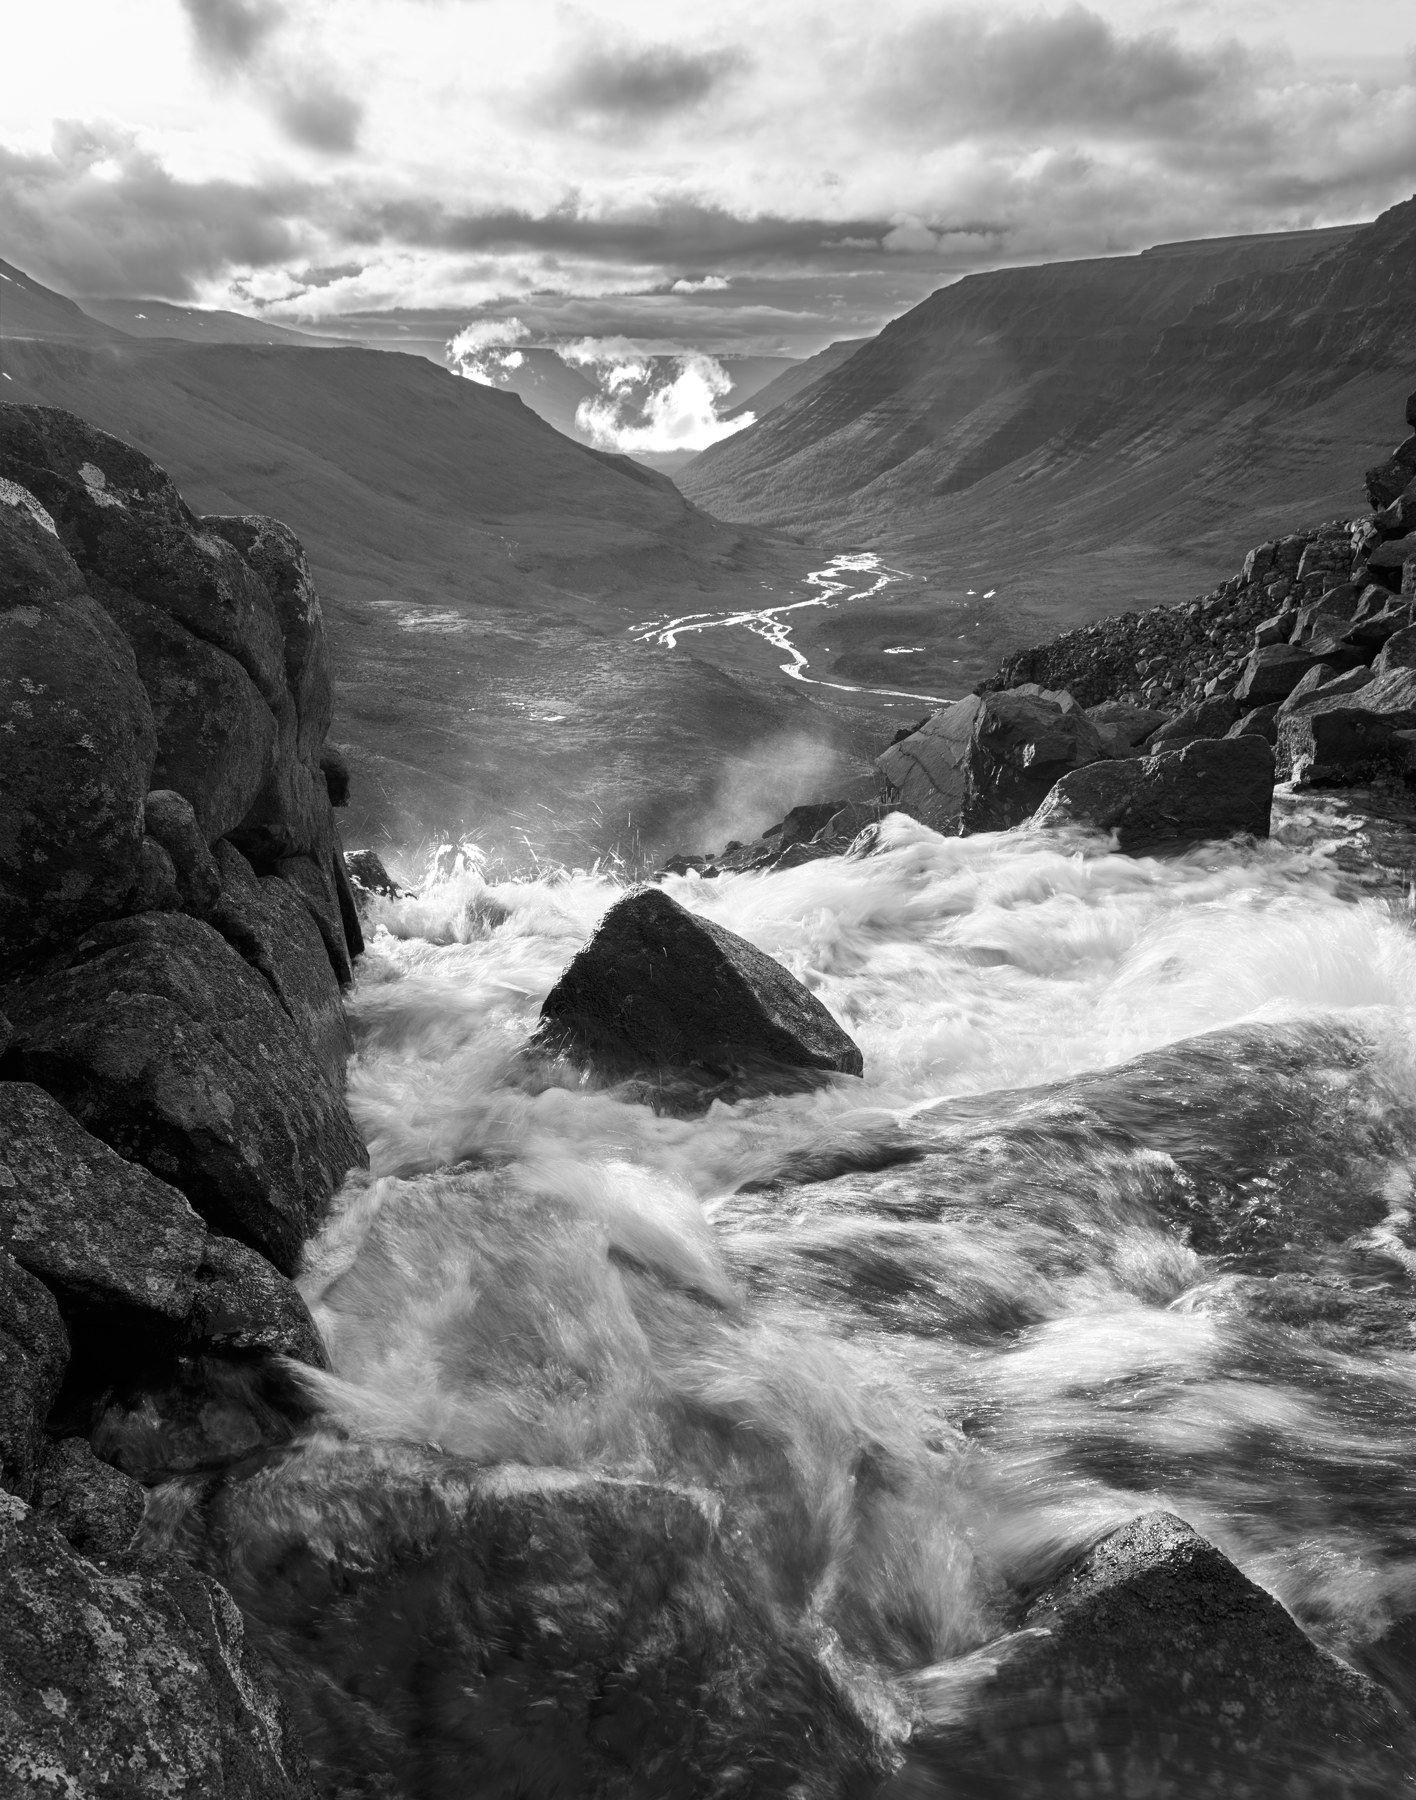 плато путорана, река, горы, таймыр, долина, водопад, Alexander